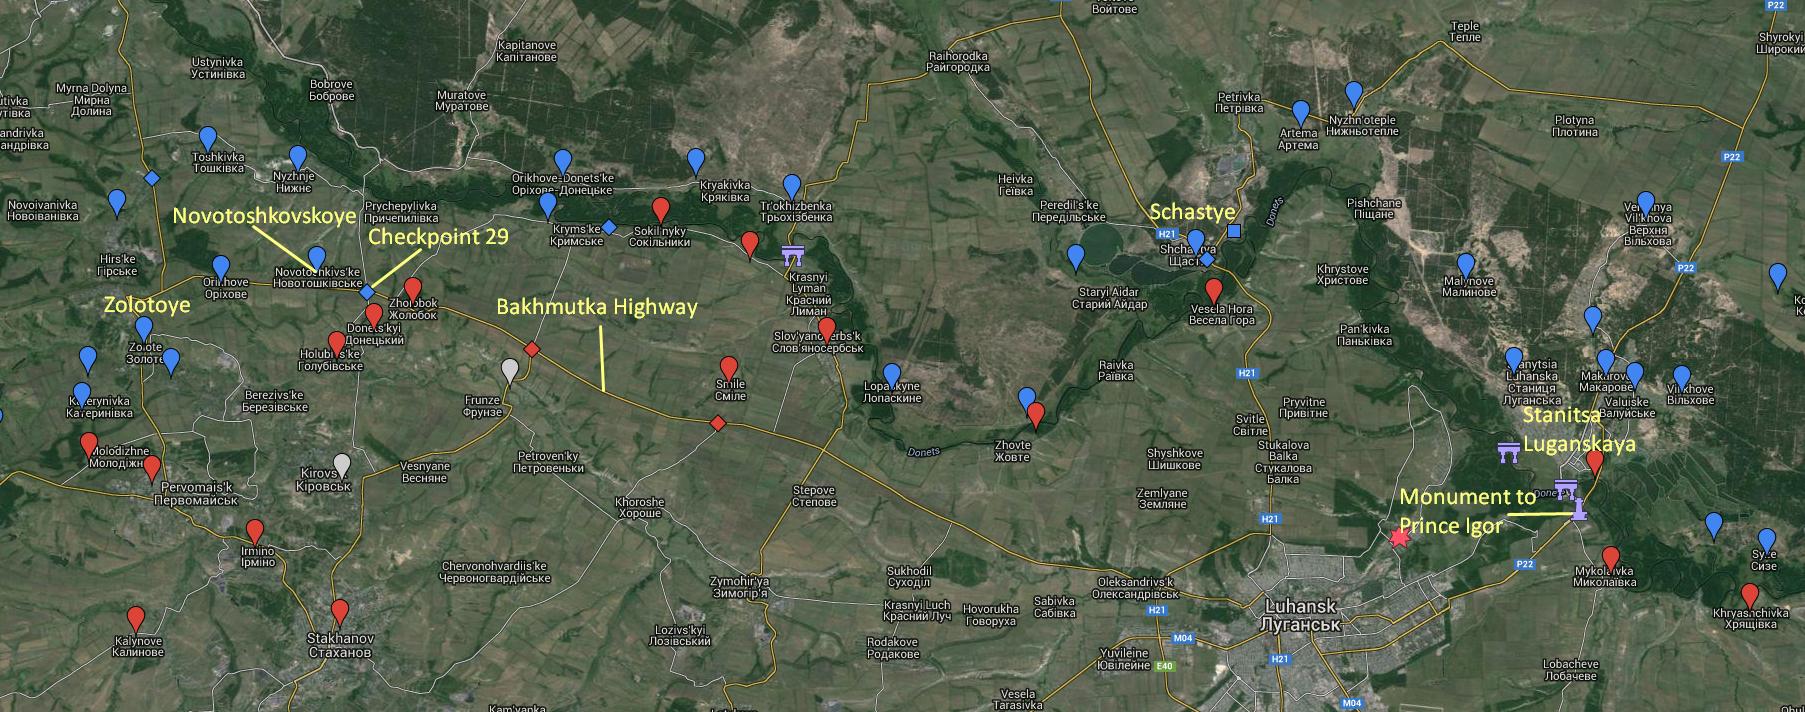 151116-lugansk-map.png